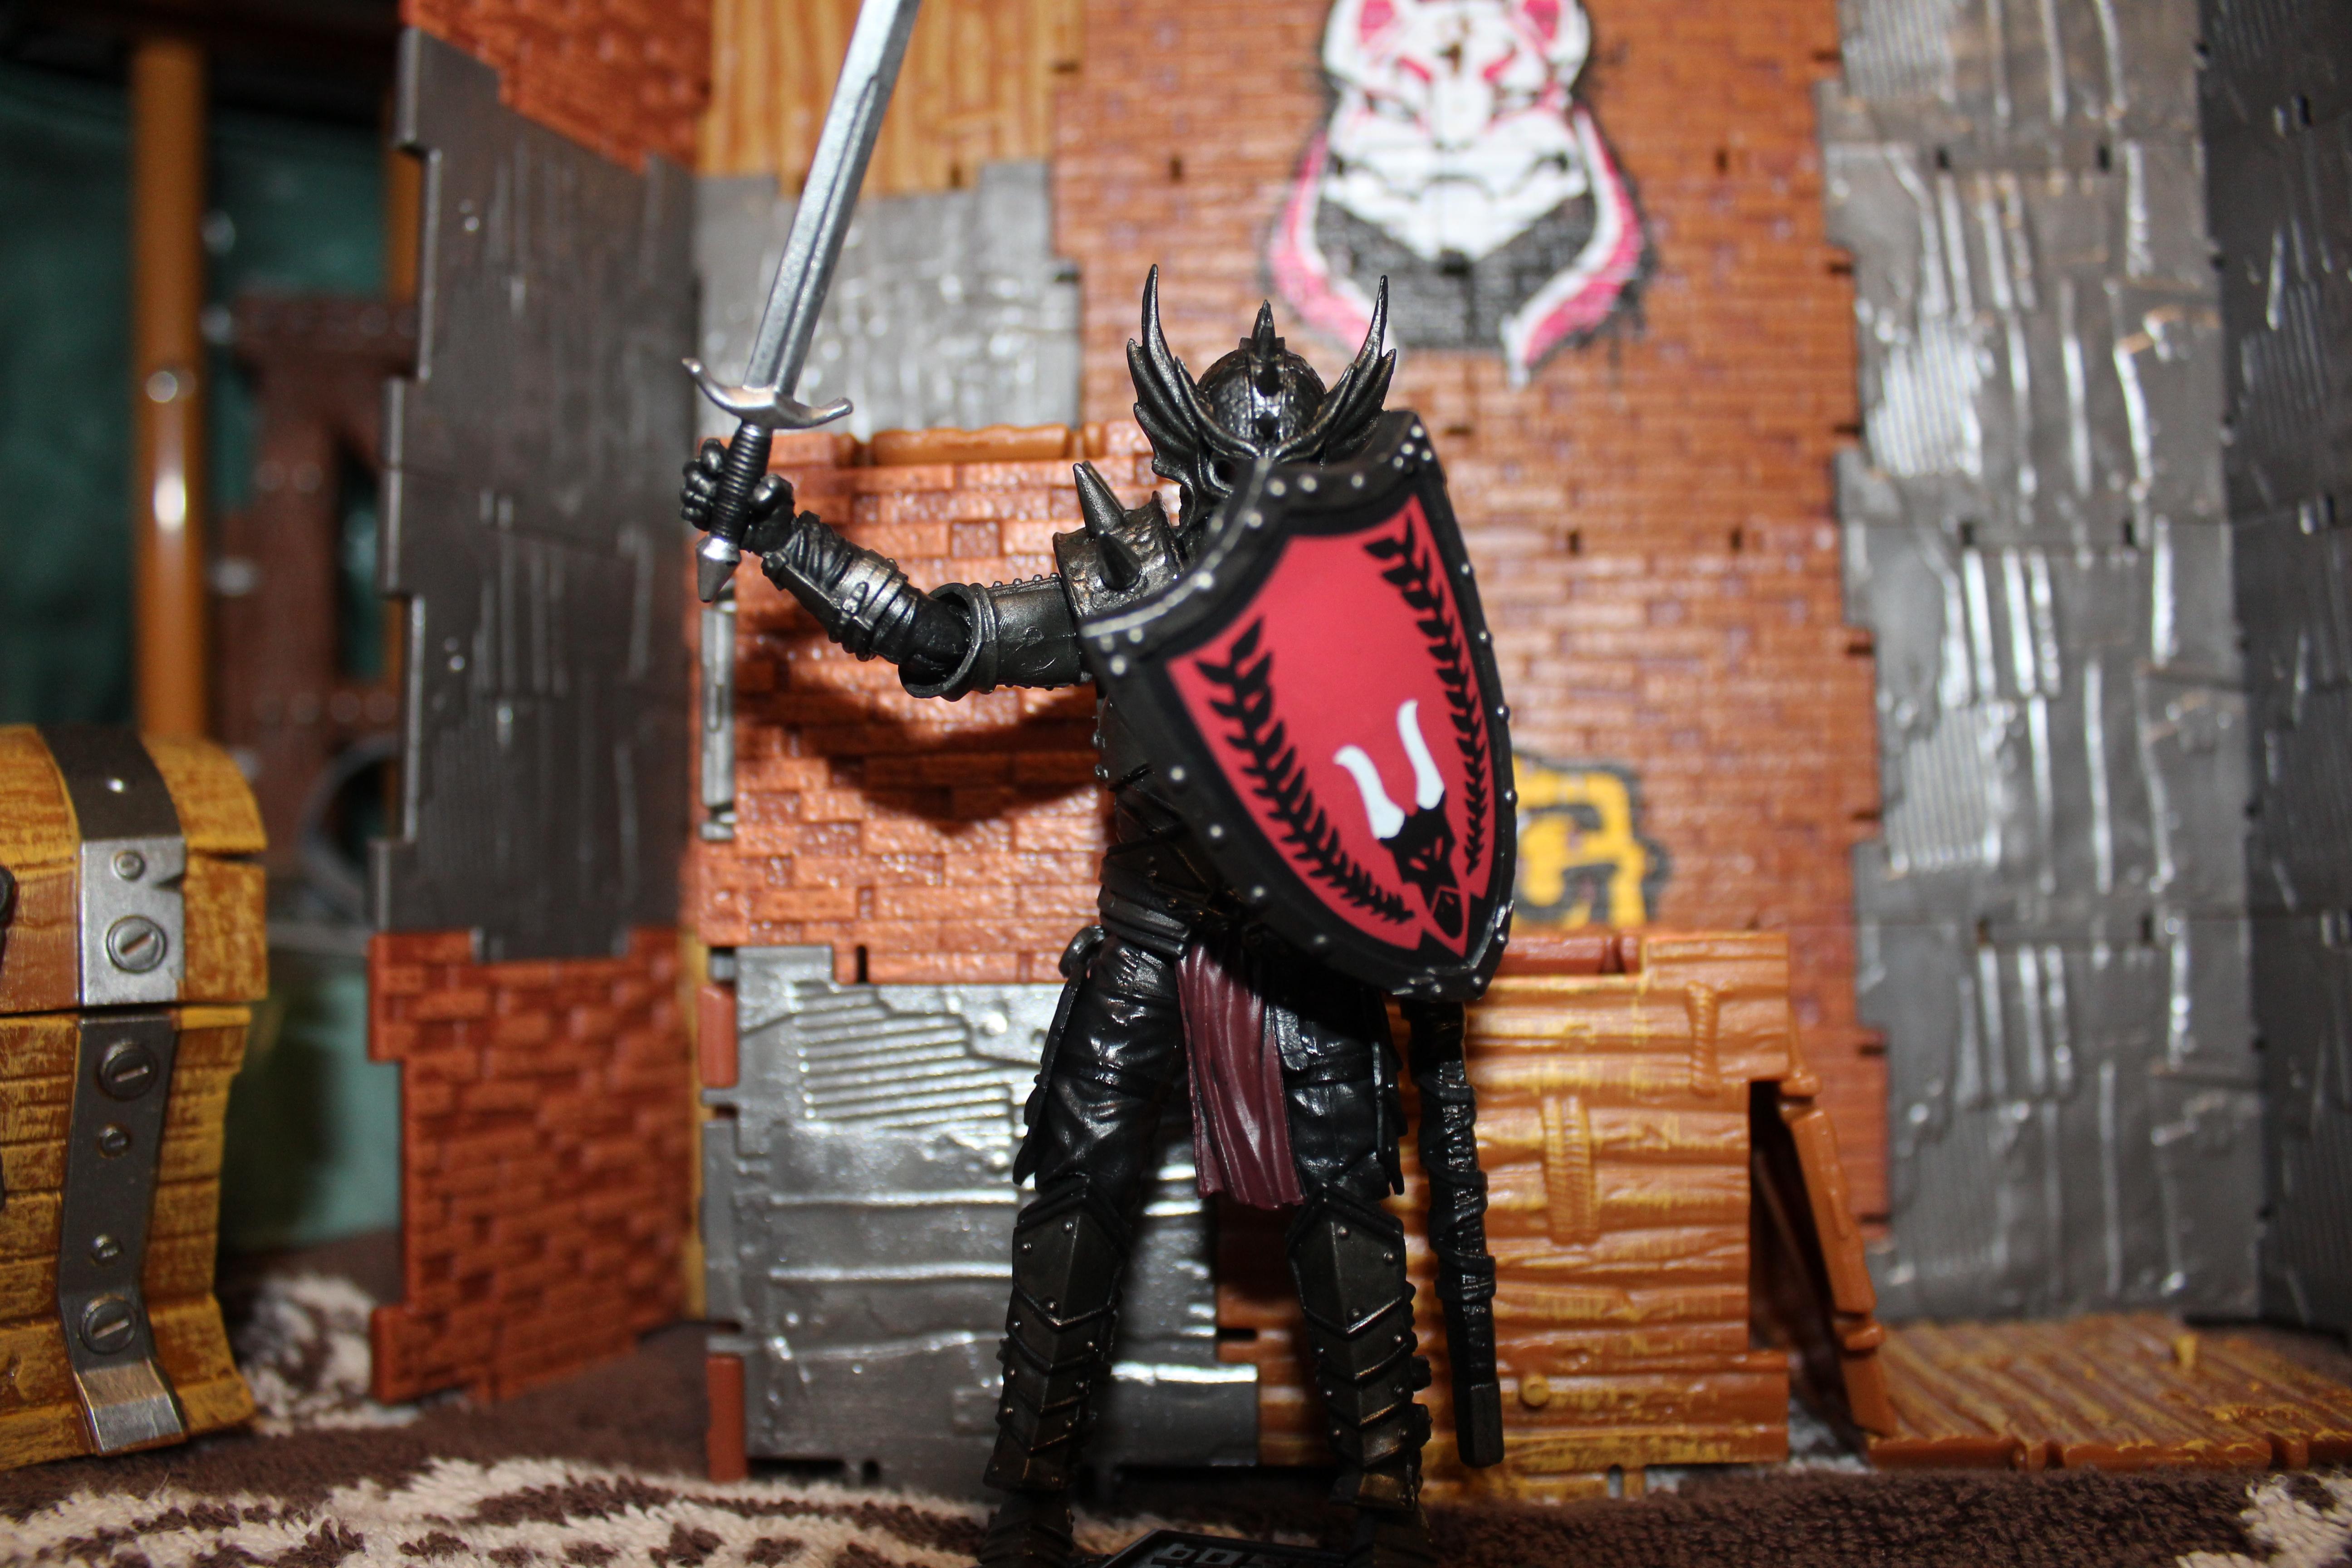 YOU PICK THE PARTS Boss Fight Studios Vitruvian HACKS CERISIER